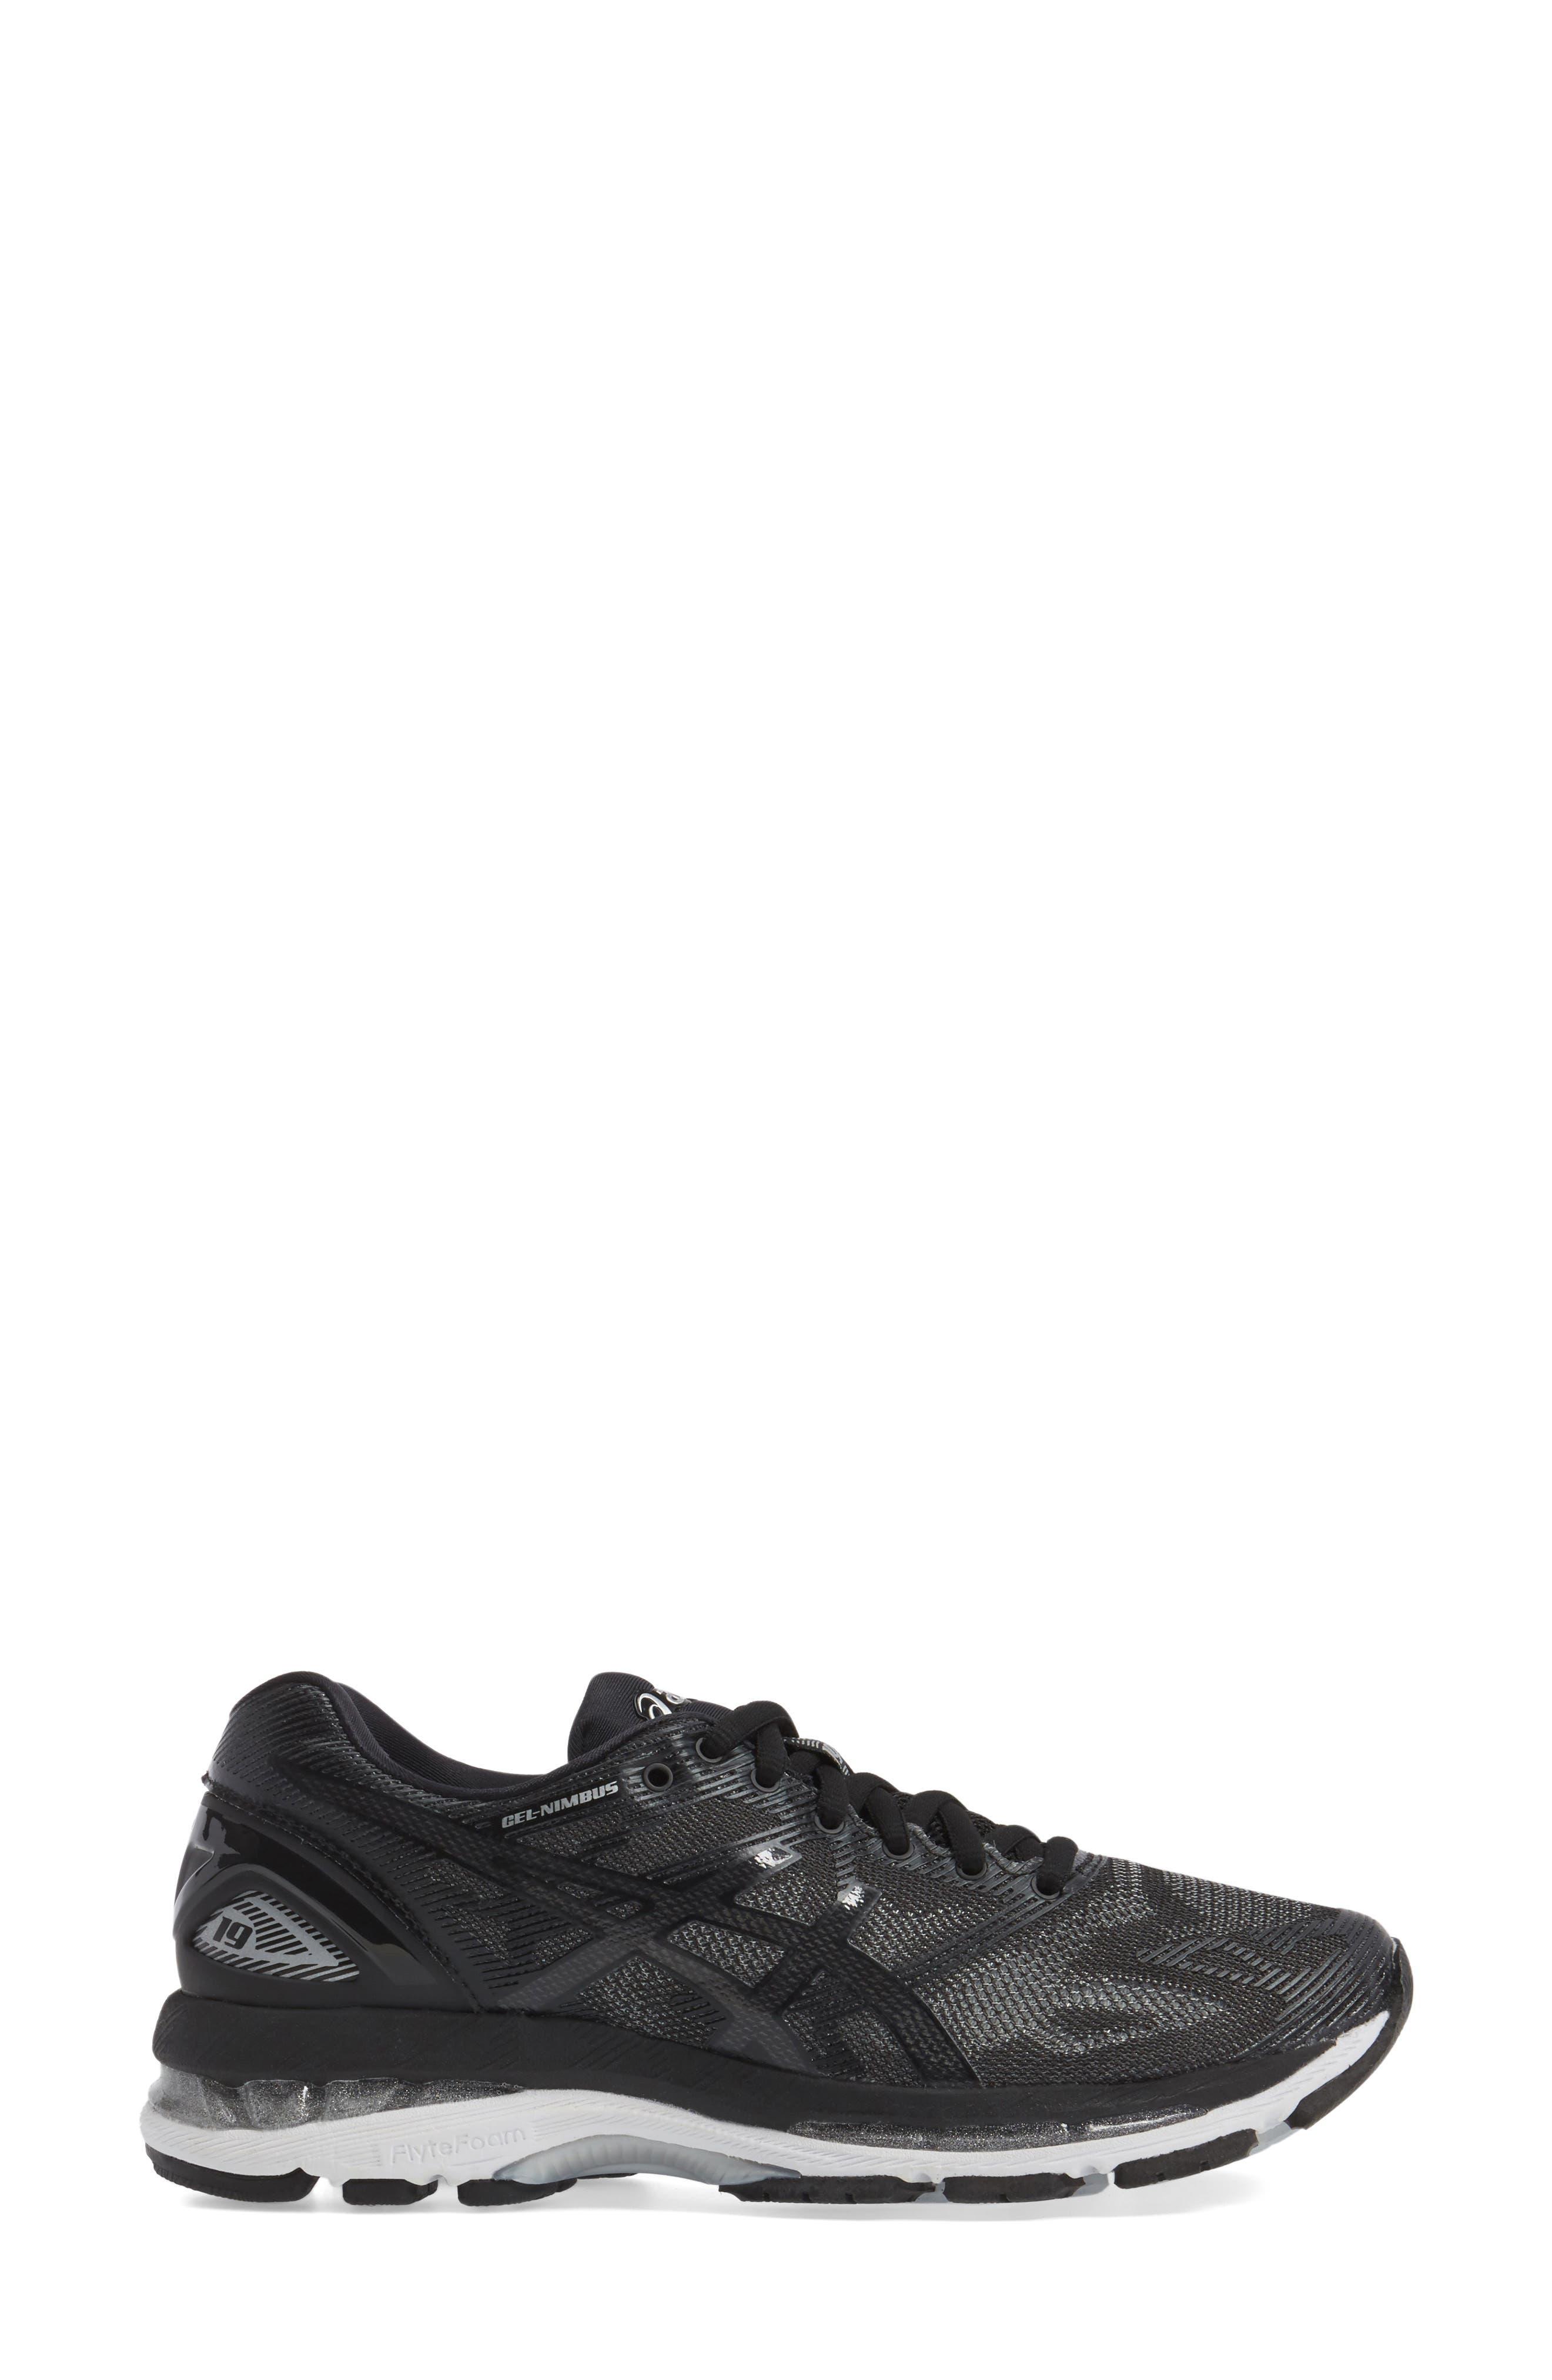 GEL<sup>®</sup>-Nimbus 19 Running Shoe,                             Alternate thumbnail 3, color,                             009